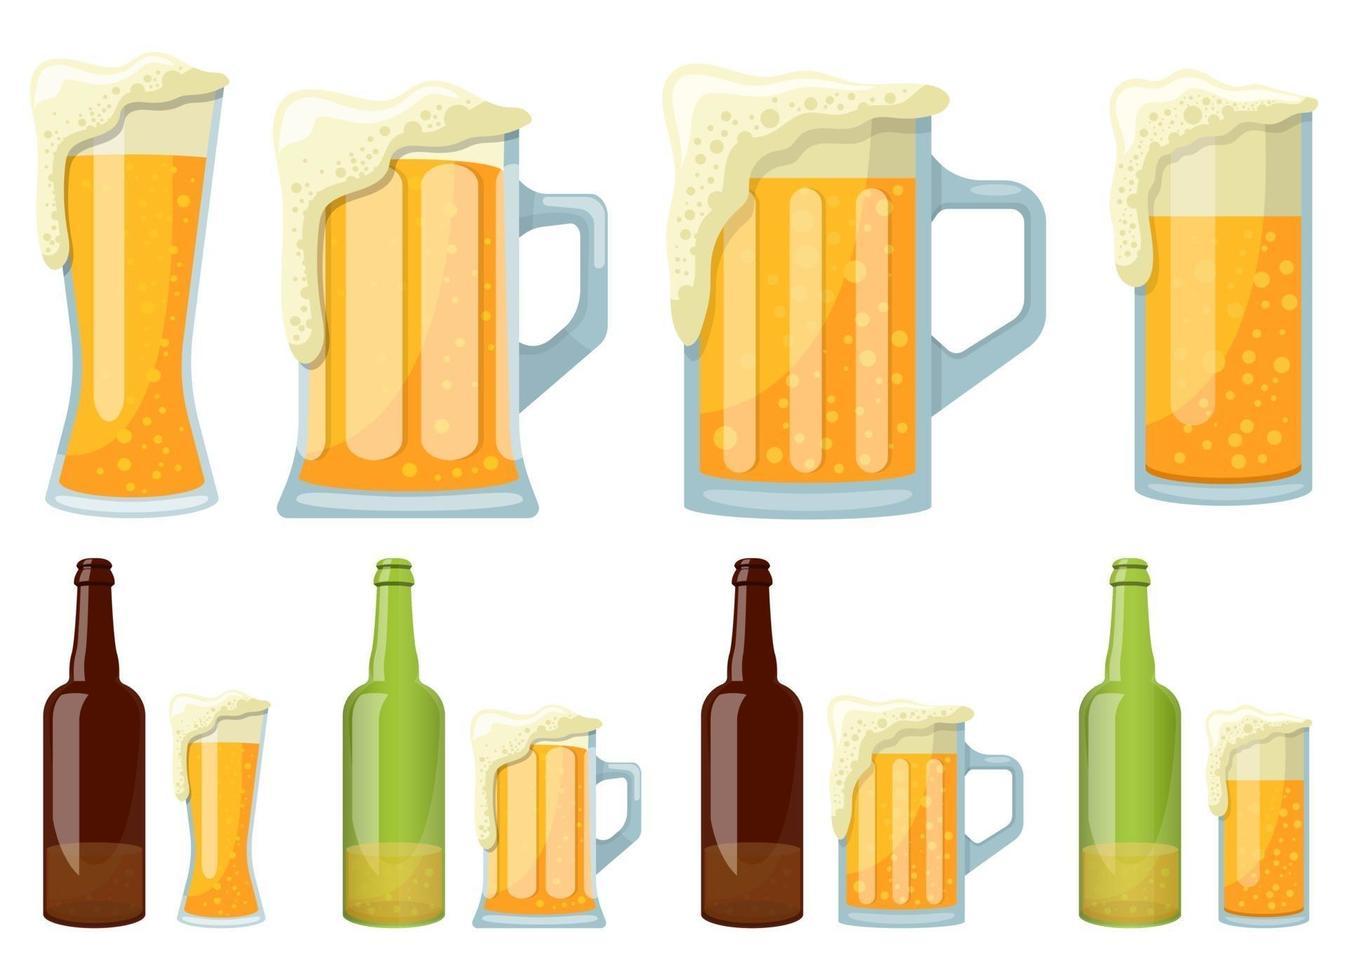 Mug and bottle of beer vector design illustration set isolated on white background